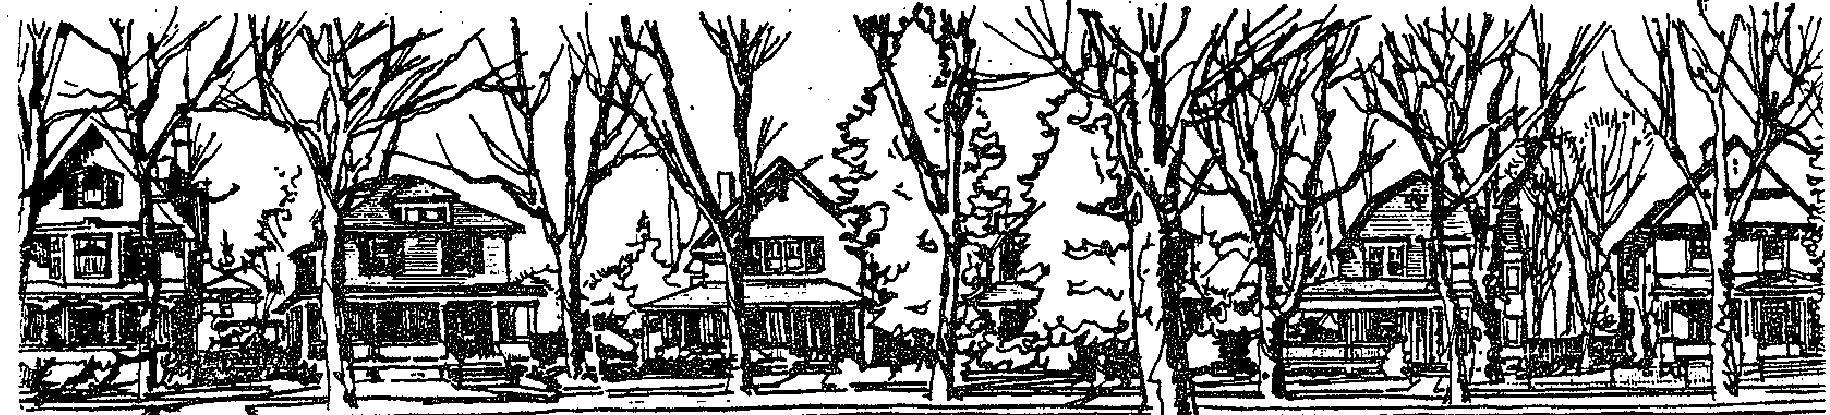 Old North End Neighborhood Master Plan